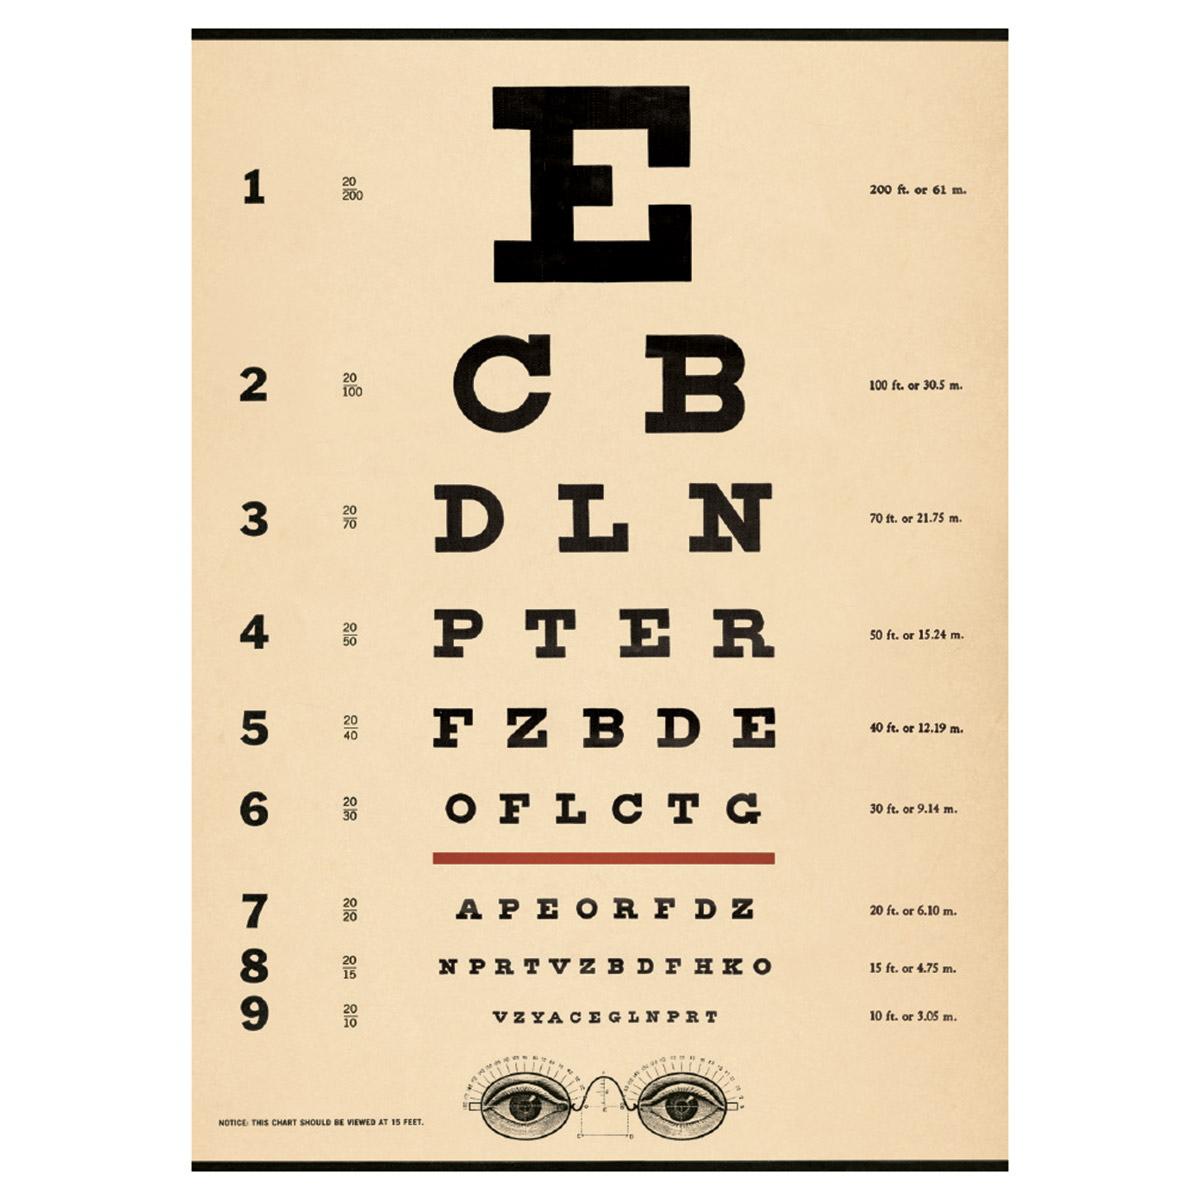 eye chart doctors office optician vintage style poster ephemera